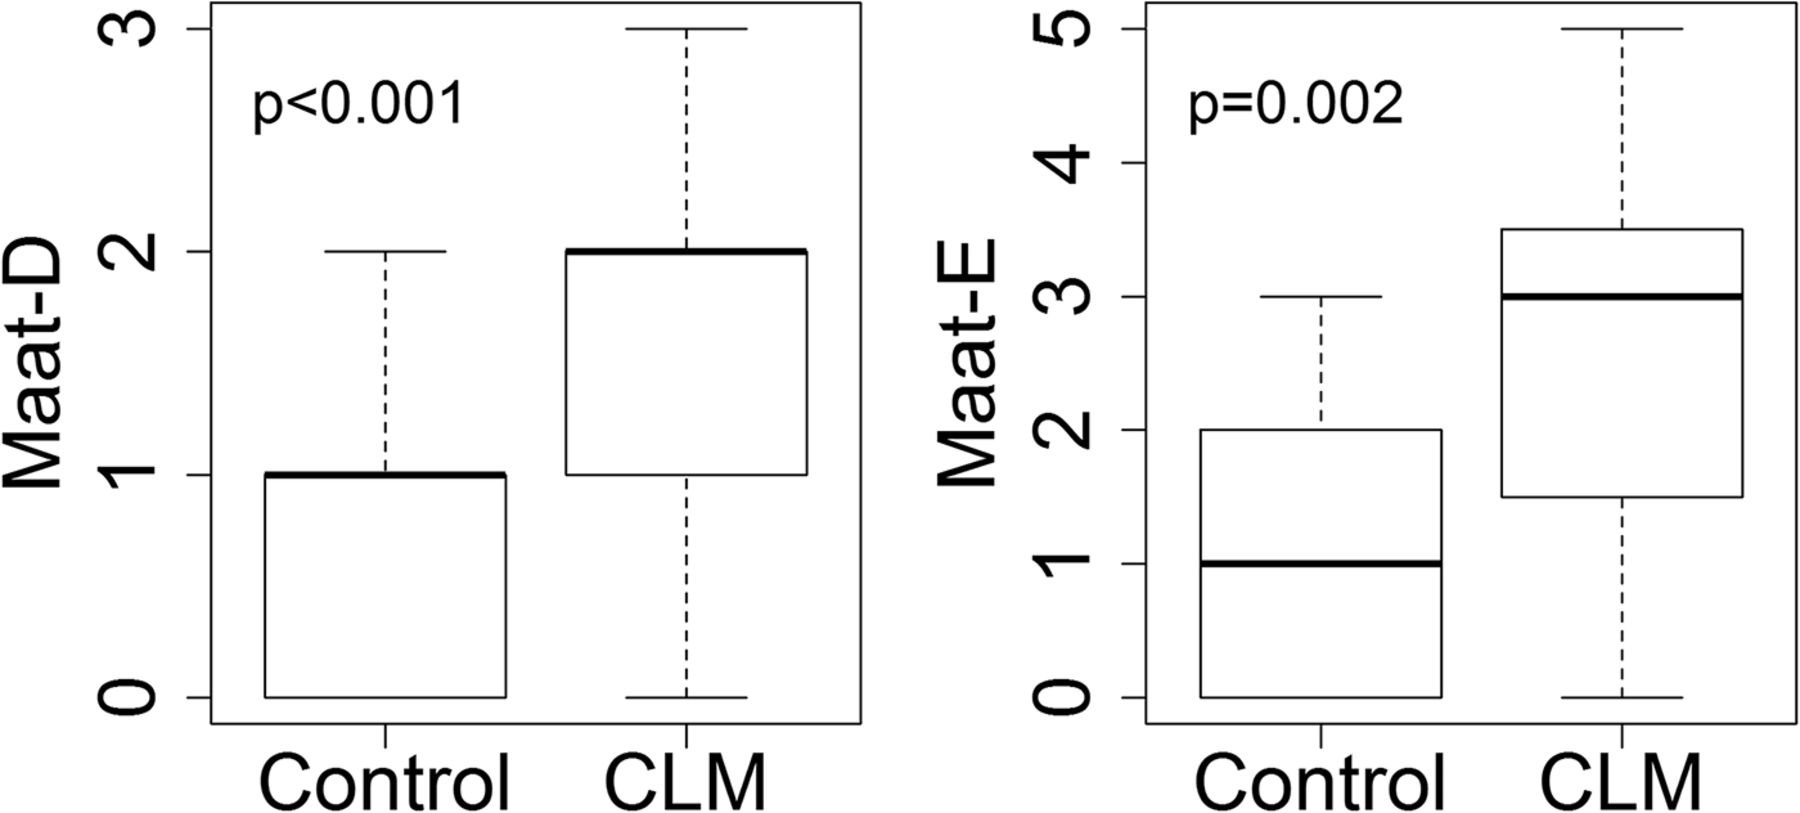 Congenital laryngomalacia is related to exercise-induced laryngeal ...